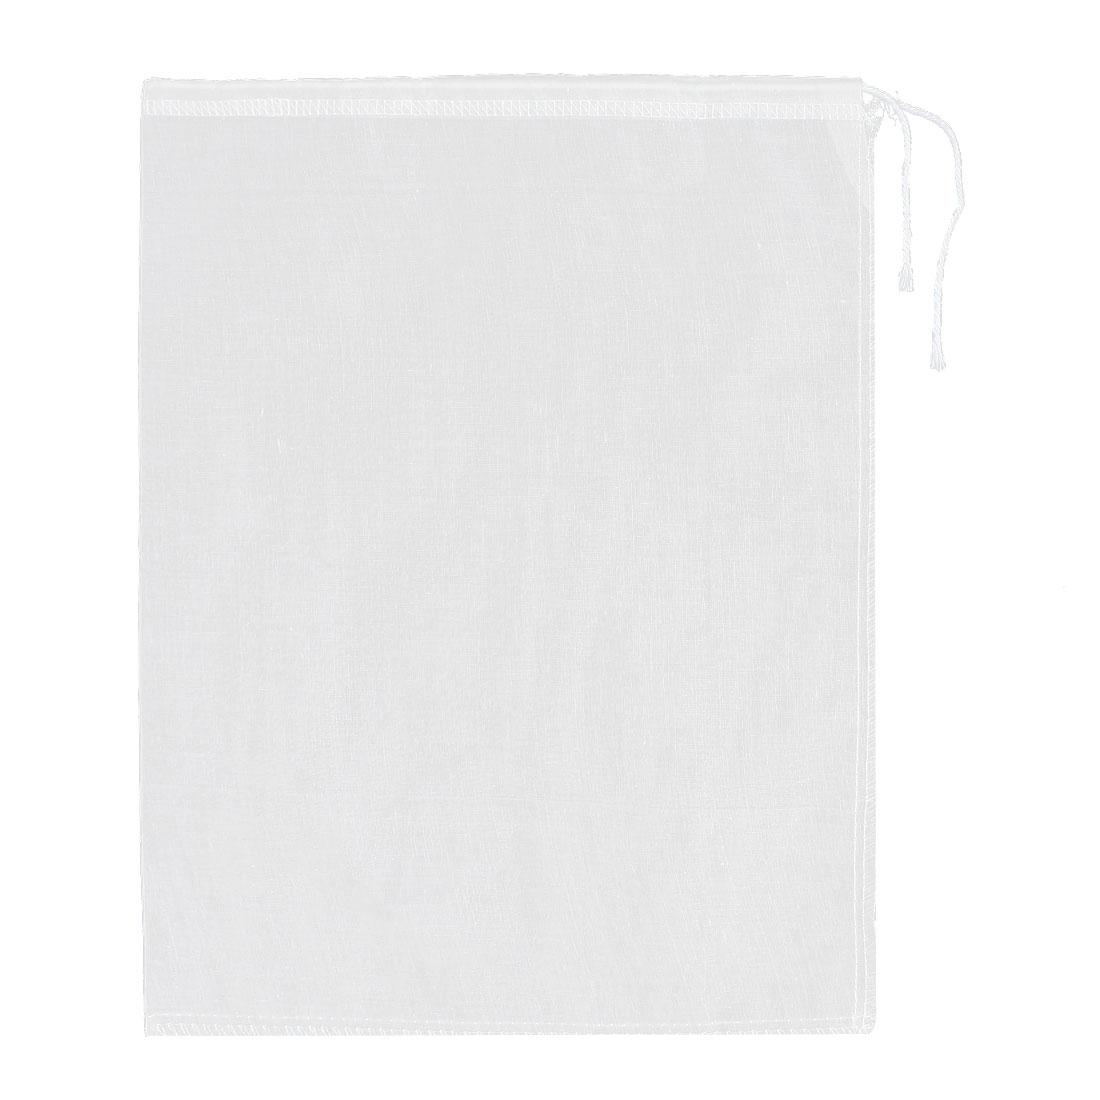 Cotton Drawstring Soup Draining Food Filter Mesh Bag 35.5cm x 28cm